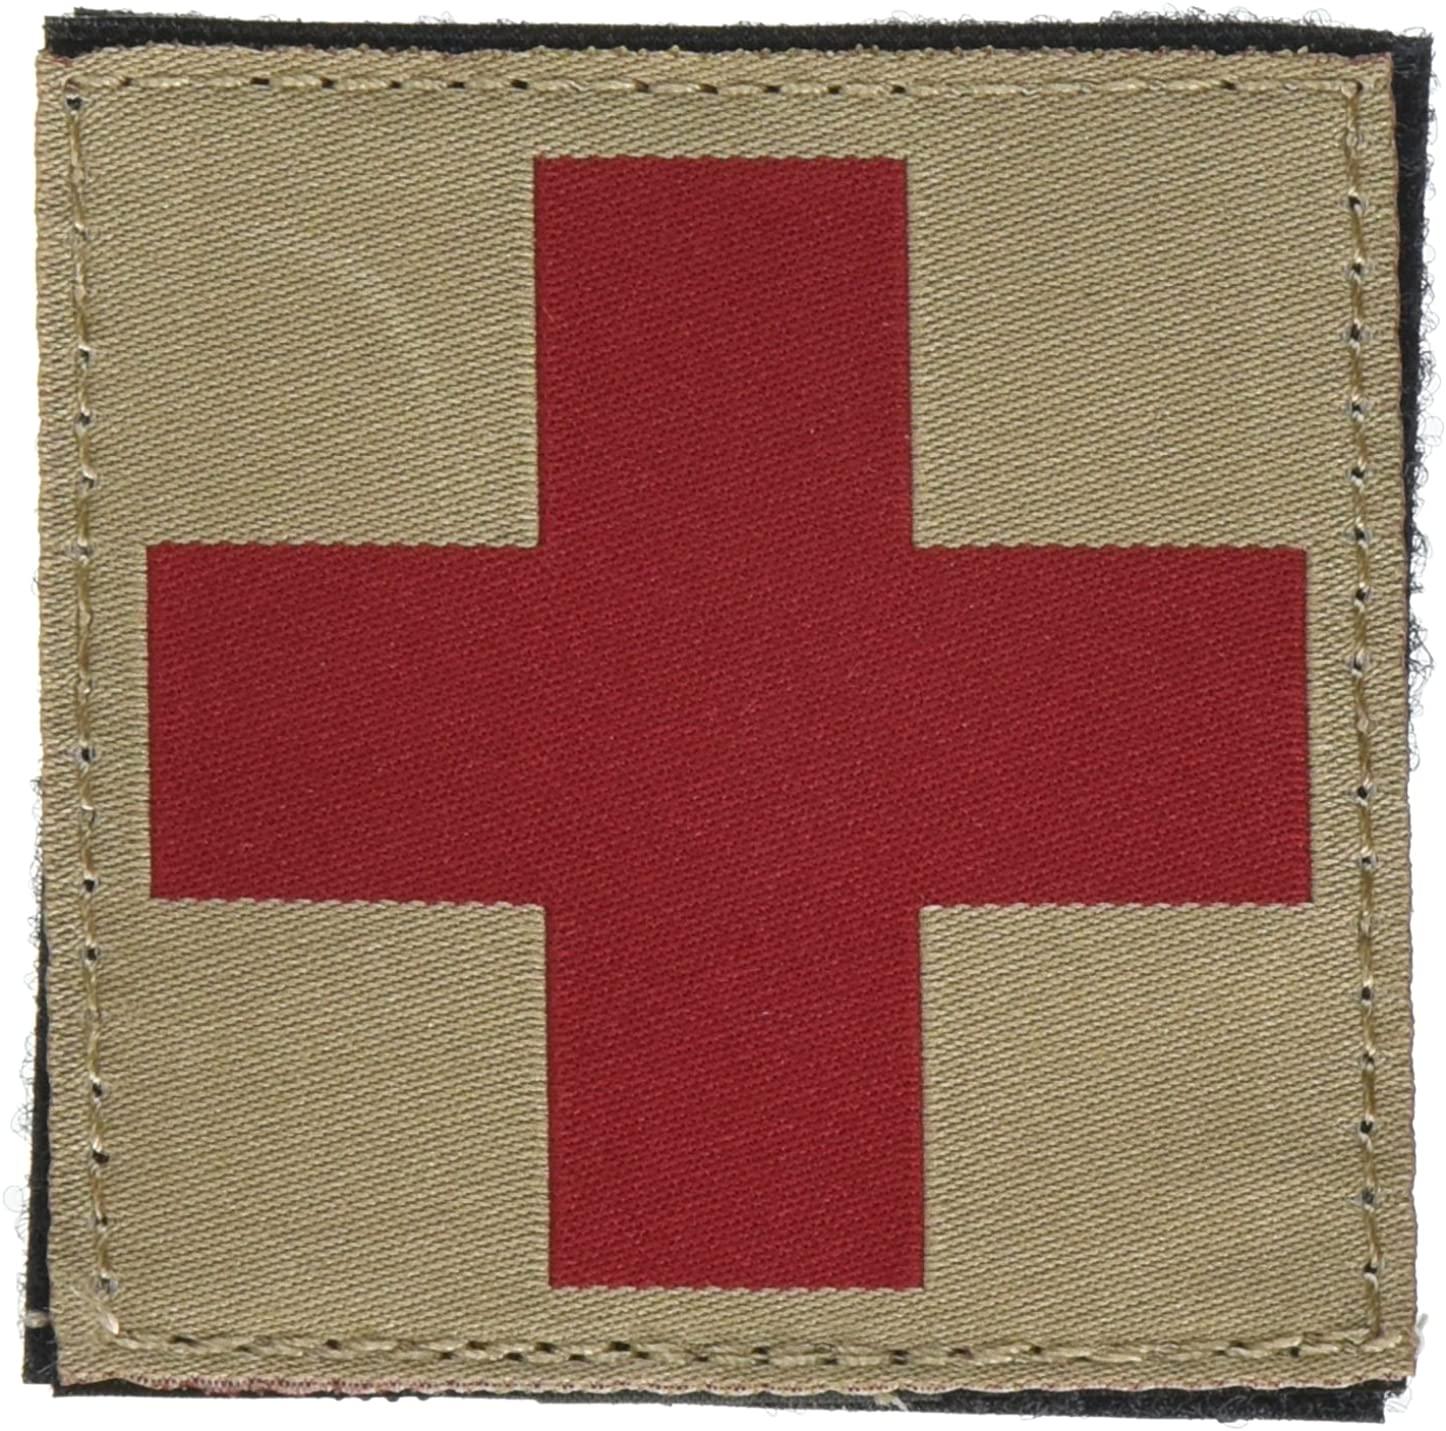 BLACKHAWK Red Cross Id Patch